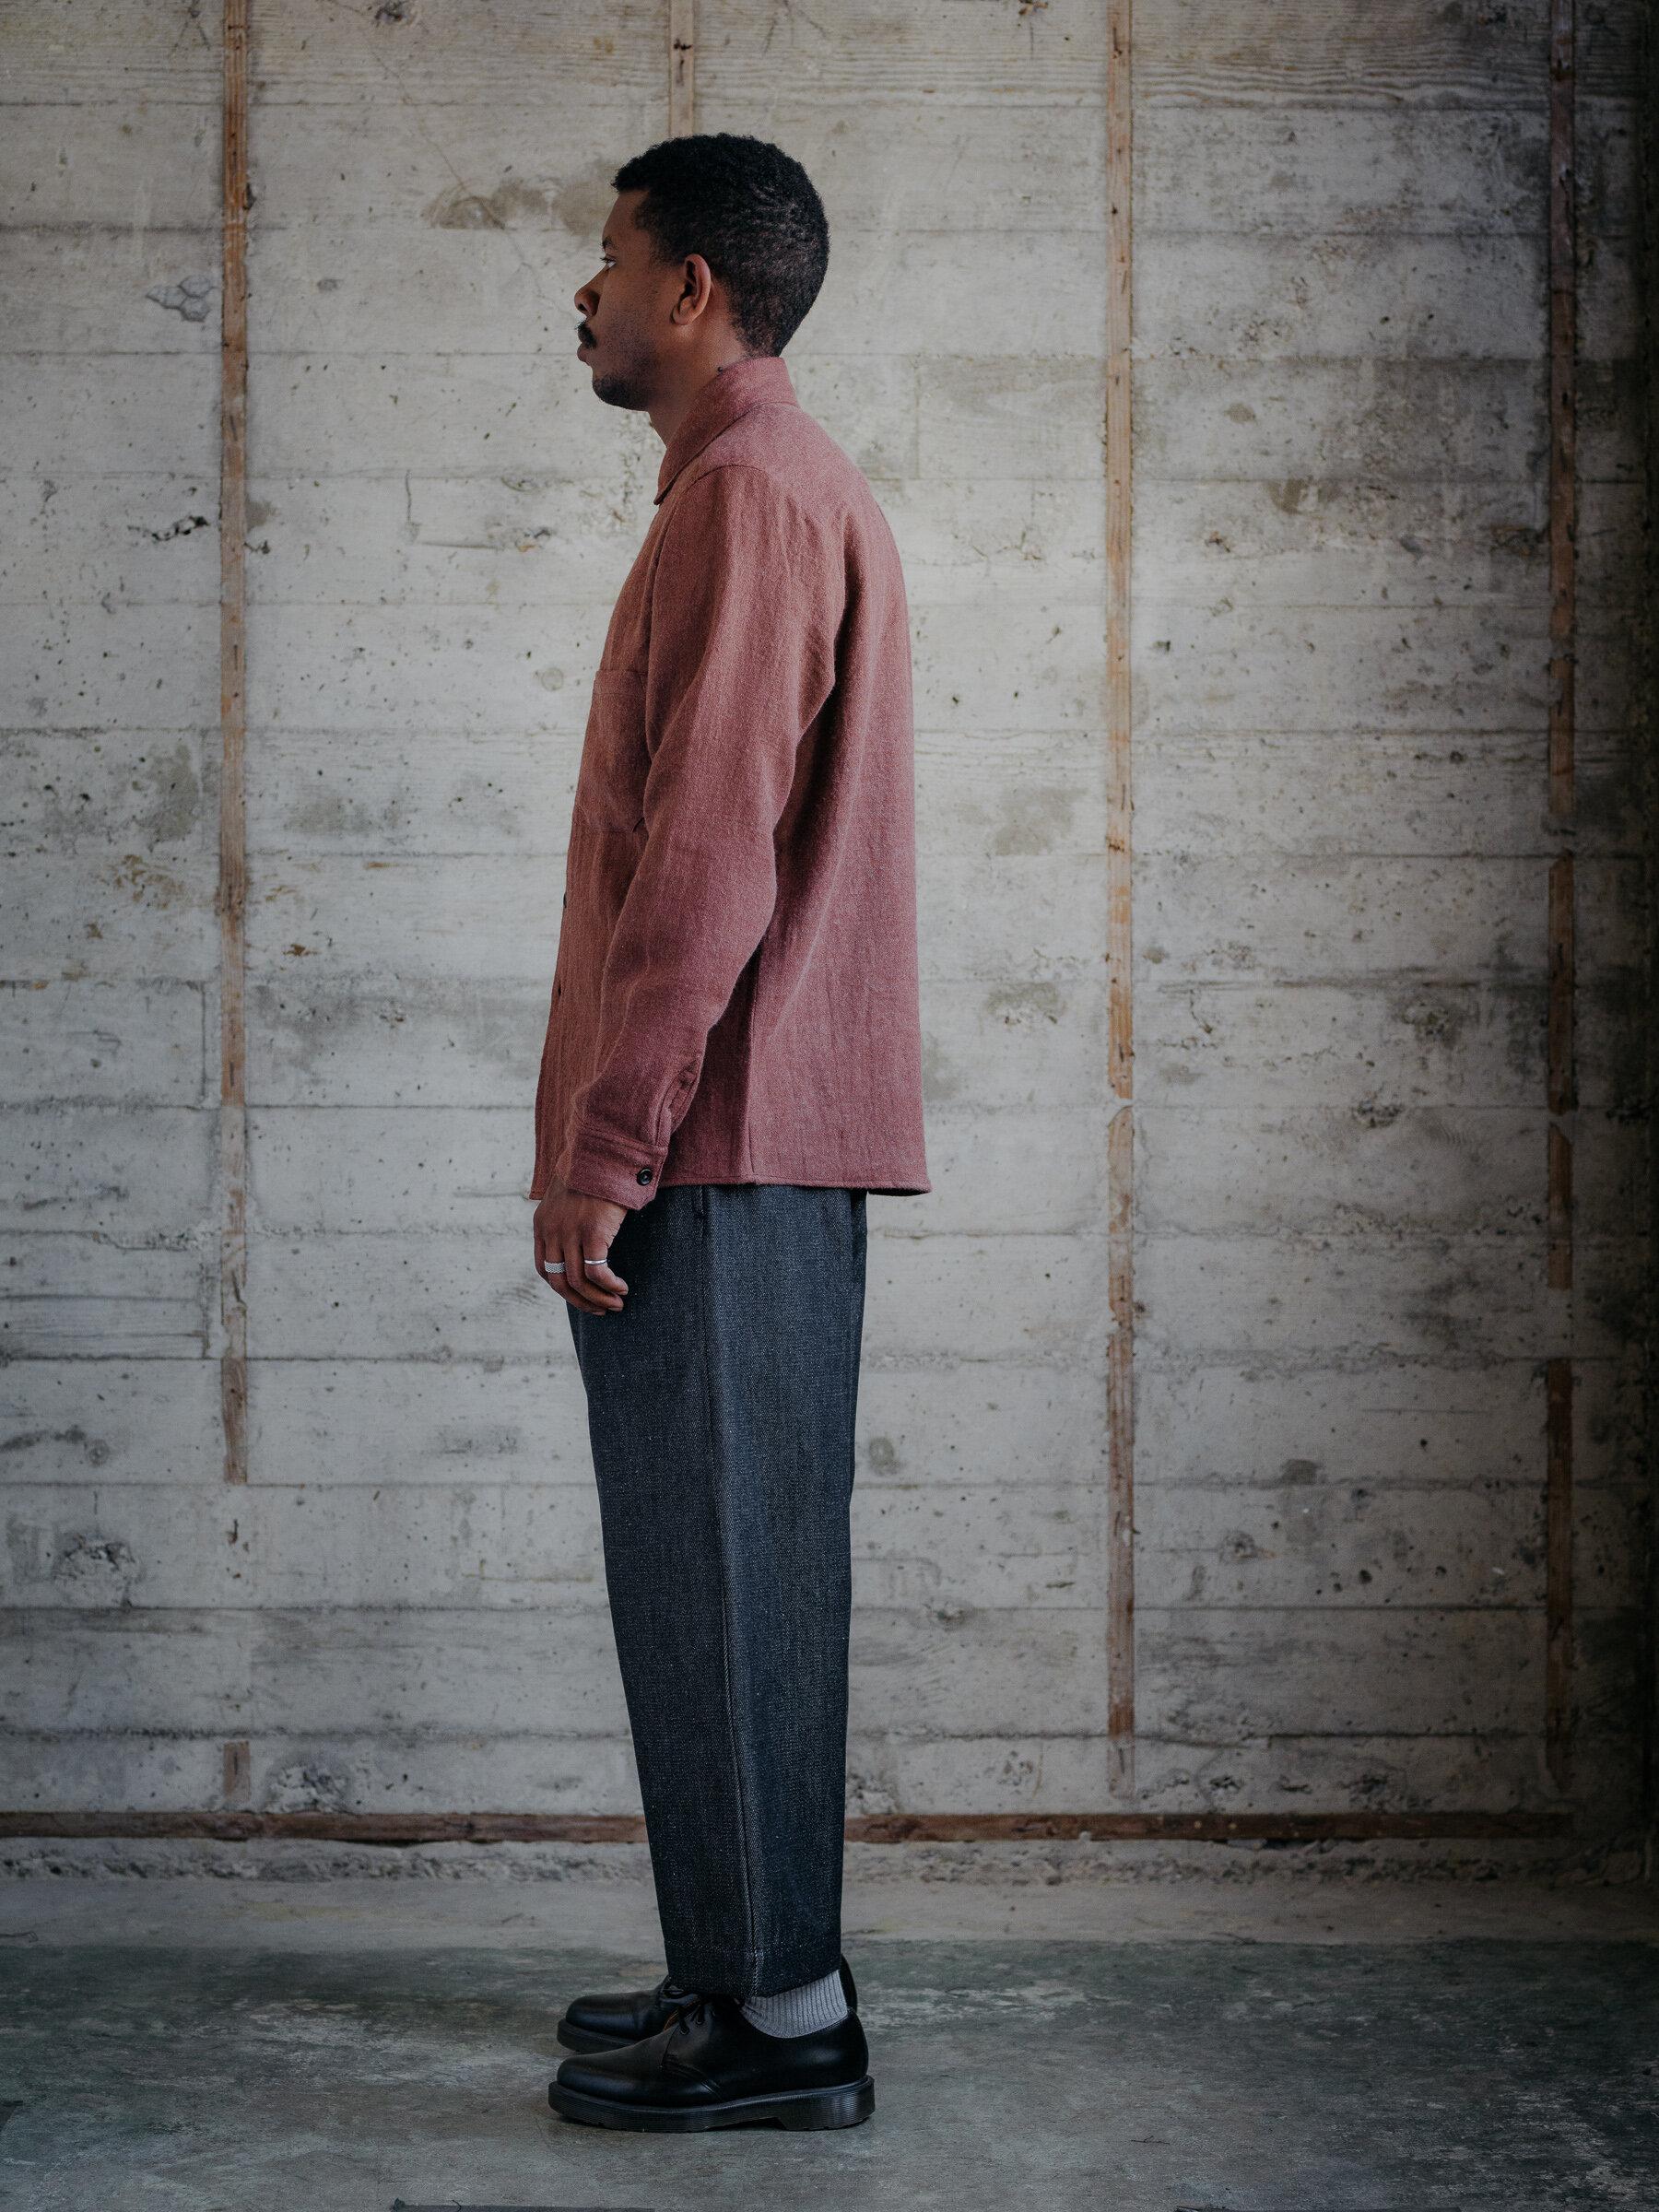 evan-kinori-two-pocket-shirt-linen-wool-twill-woven-in-japan-3